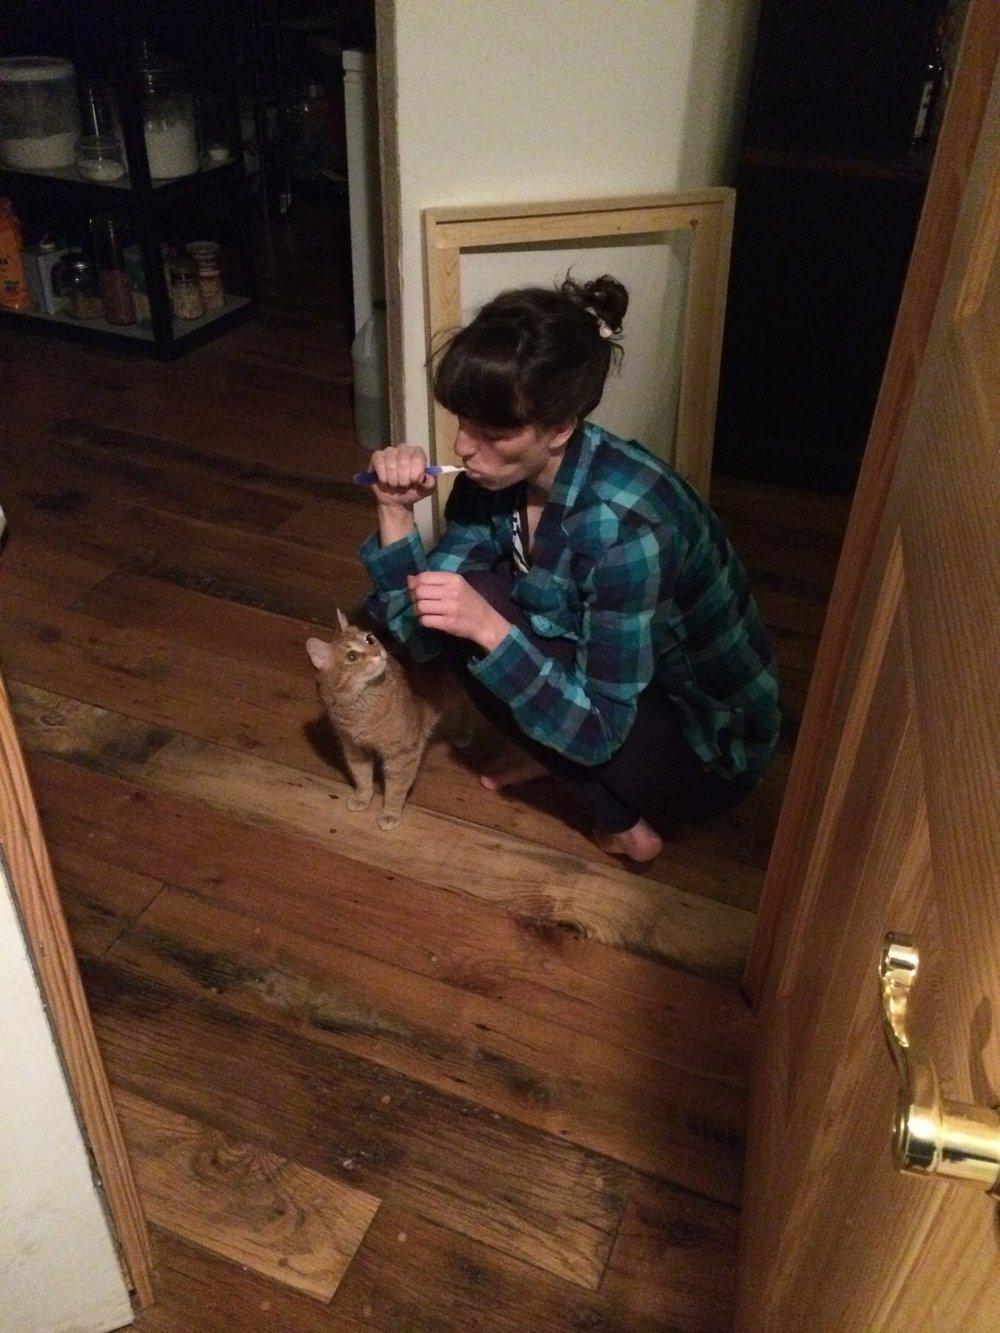 brushing my teeth? yep, still an artist